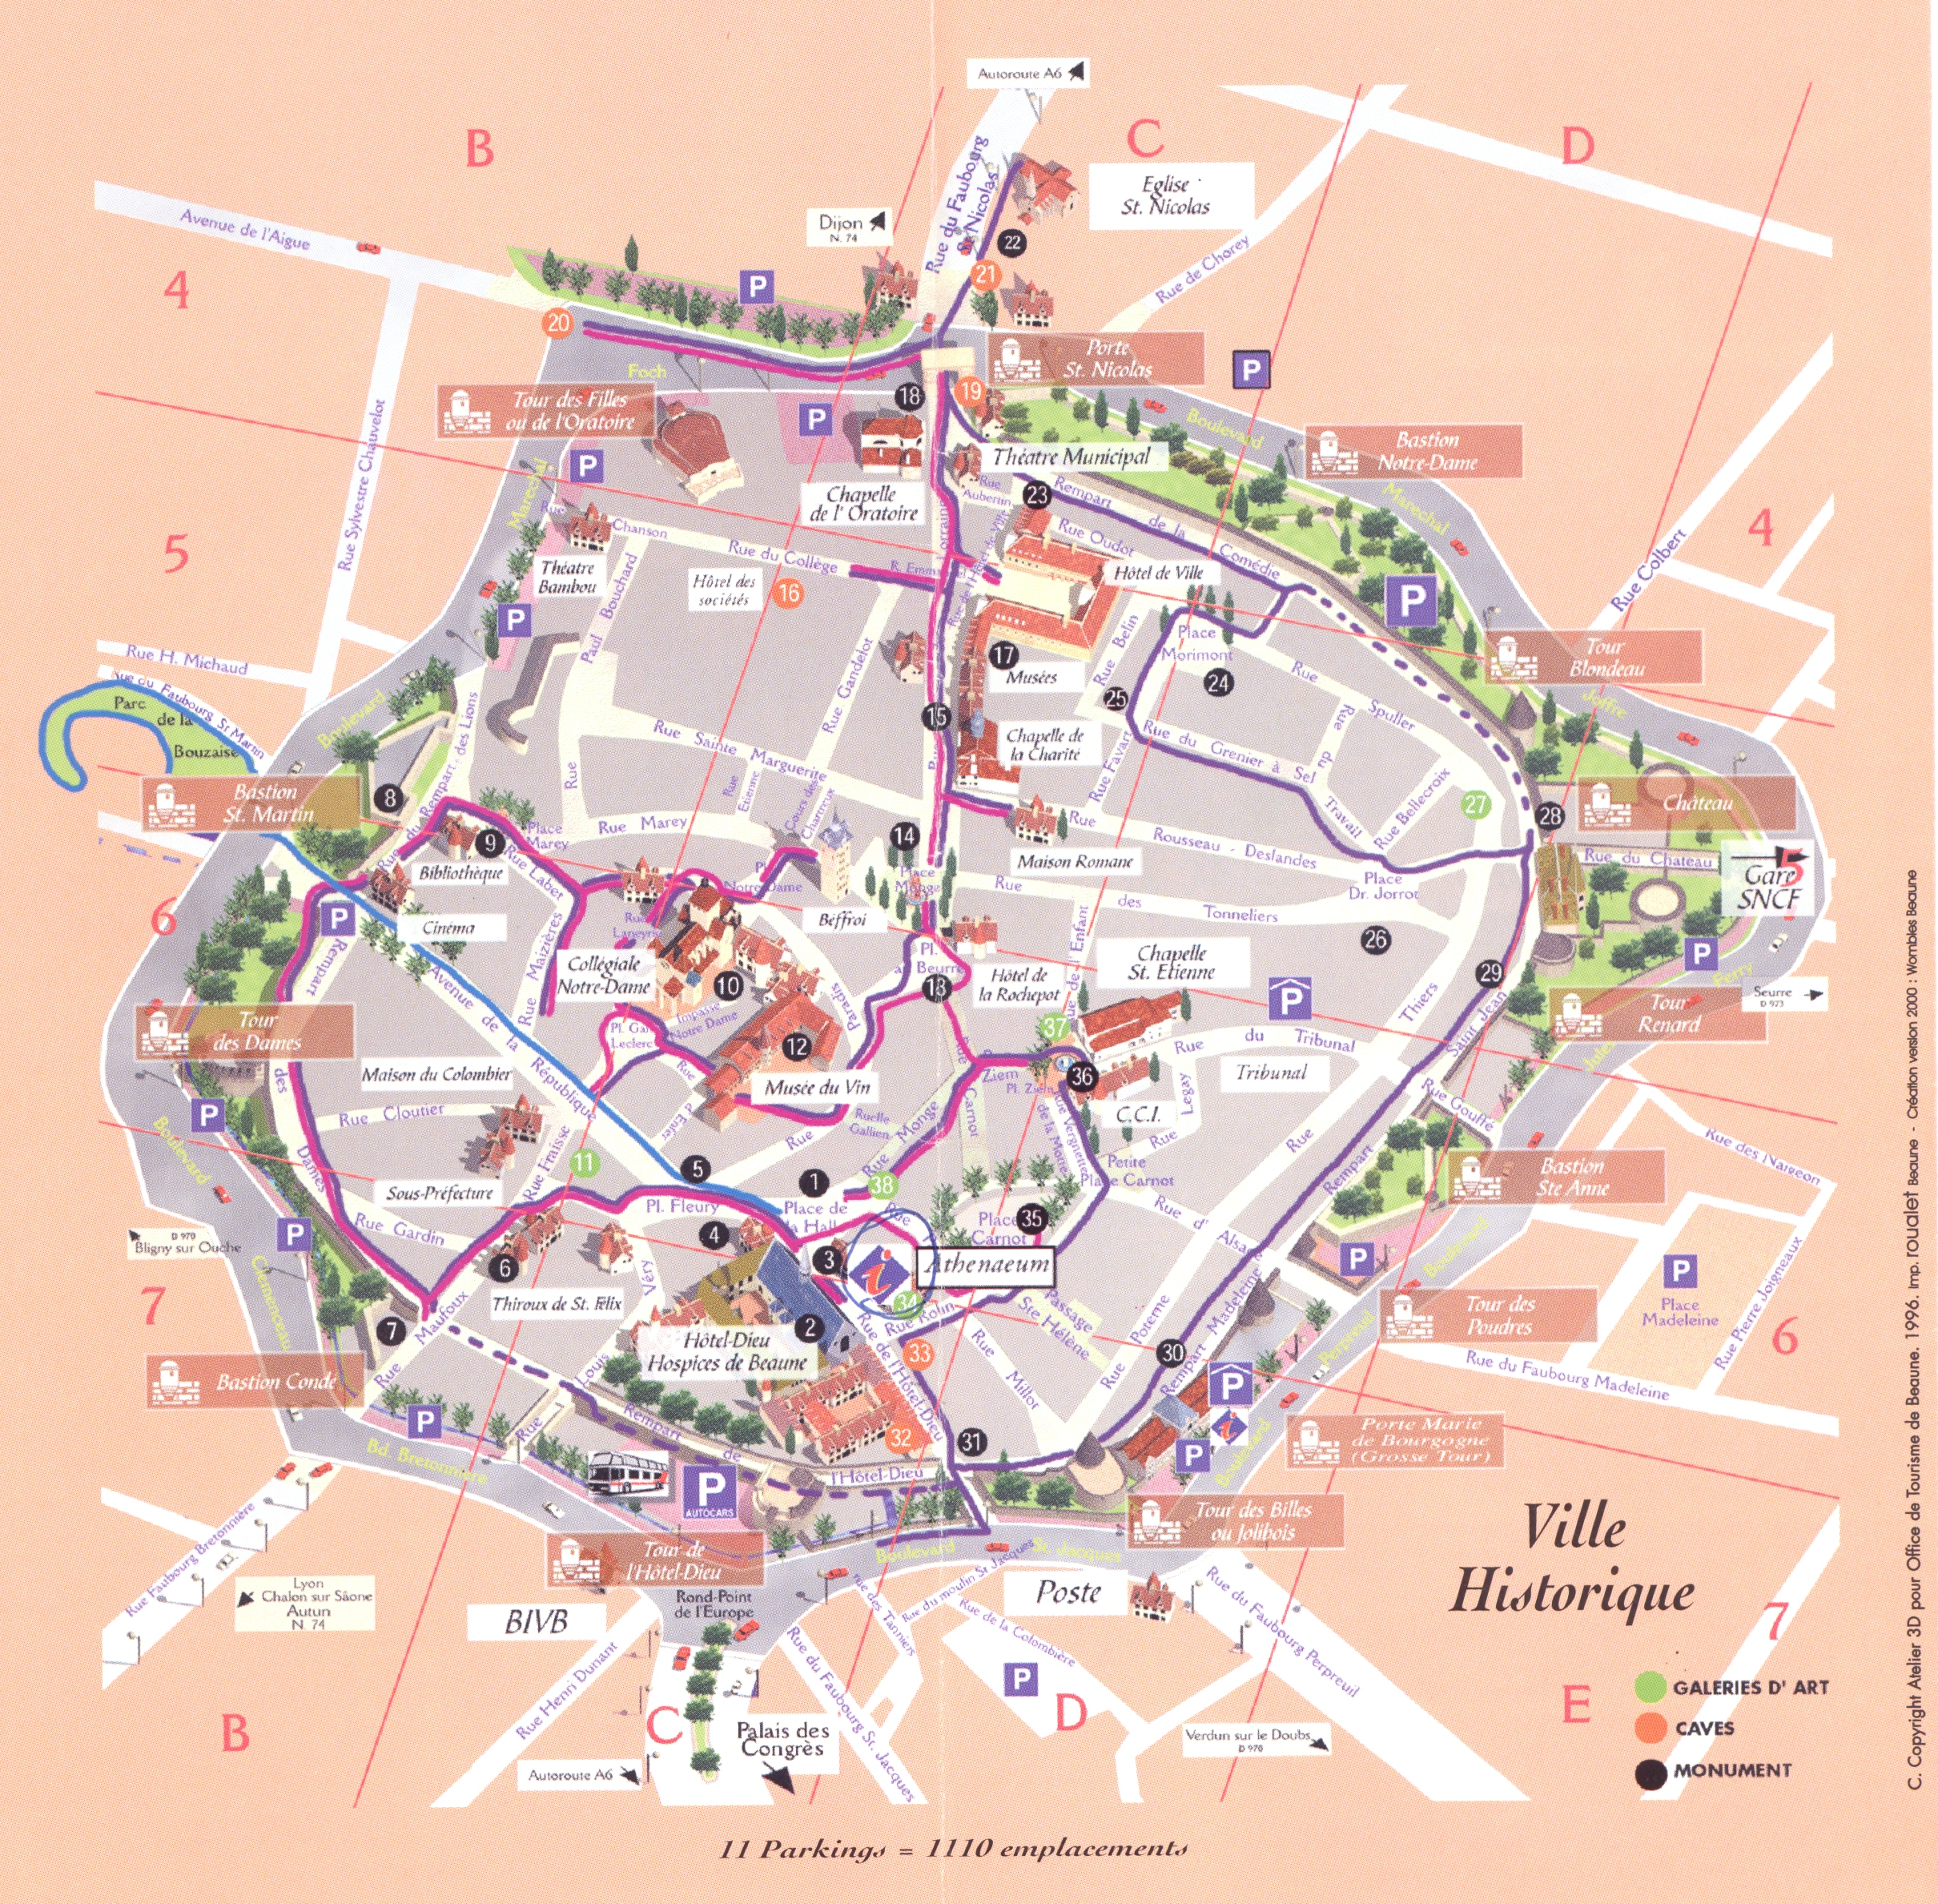 Beaune (Бон), Бургундия, Франция - достопримечательности на карте города, туристический маршрут по Бону